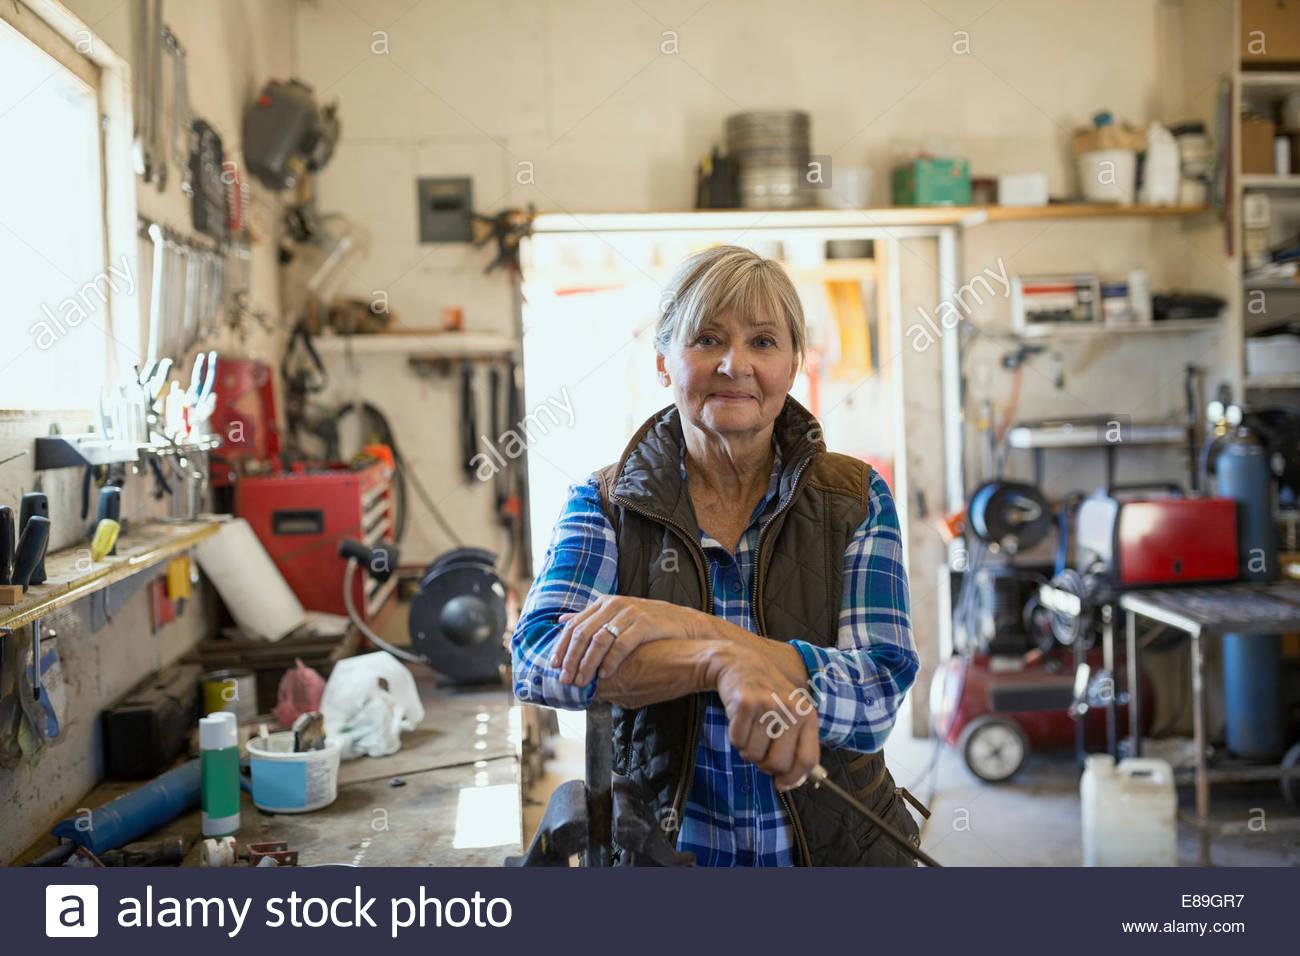 Porträt der selbstbewusste Frau in Werkstatt Stockbild